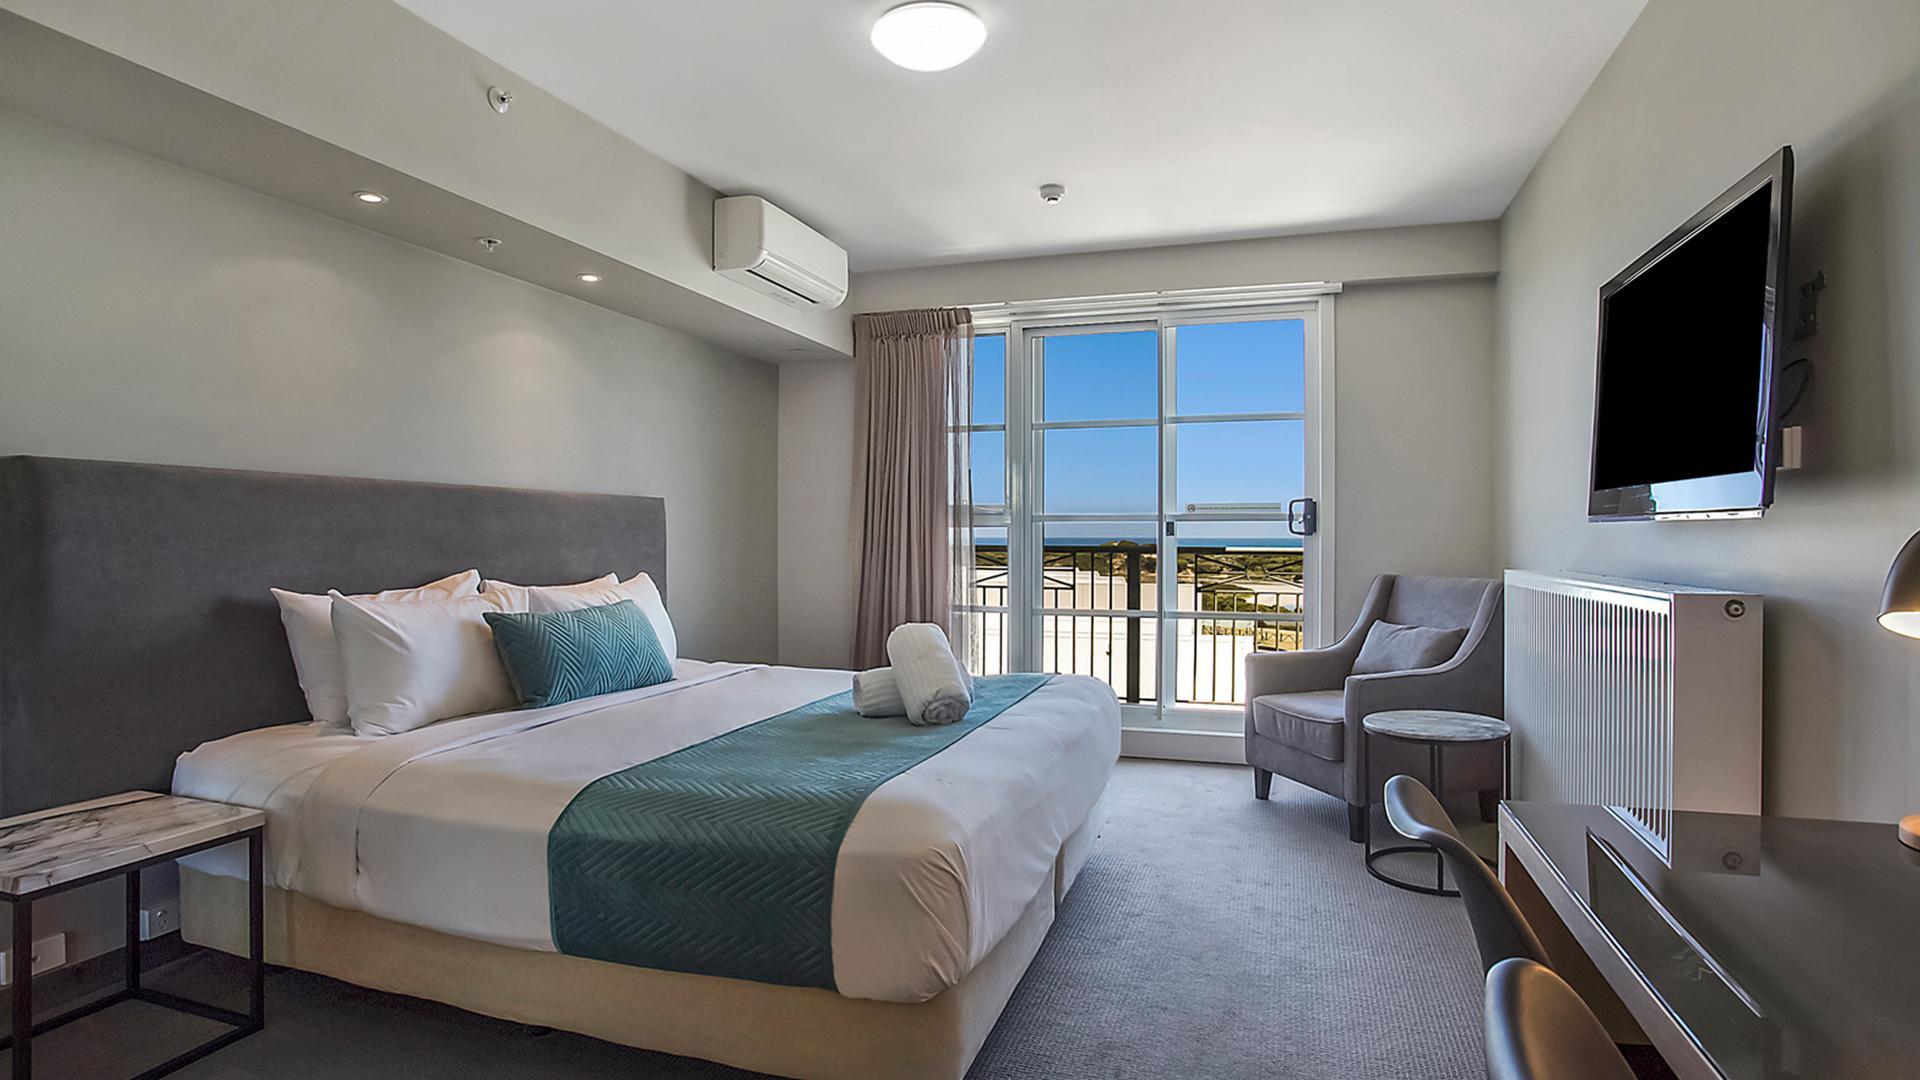 Ocean-View Studio King image 1 at Deep Blue Hotel & Hot Springs by Warrnambool City, Victoria, Australia